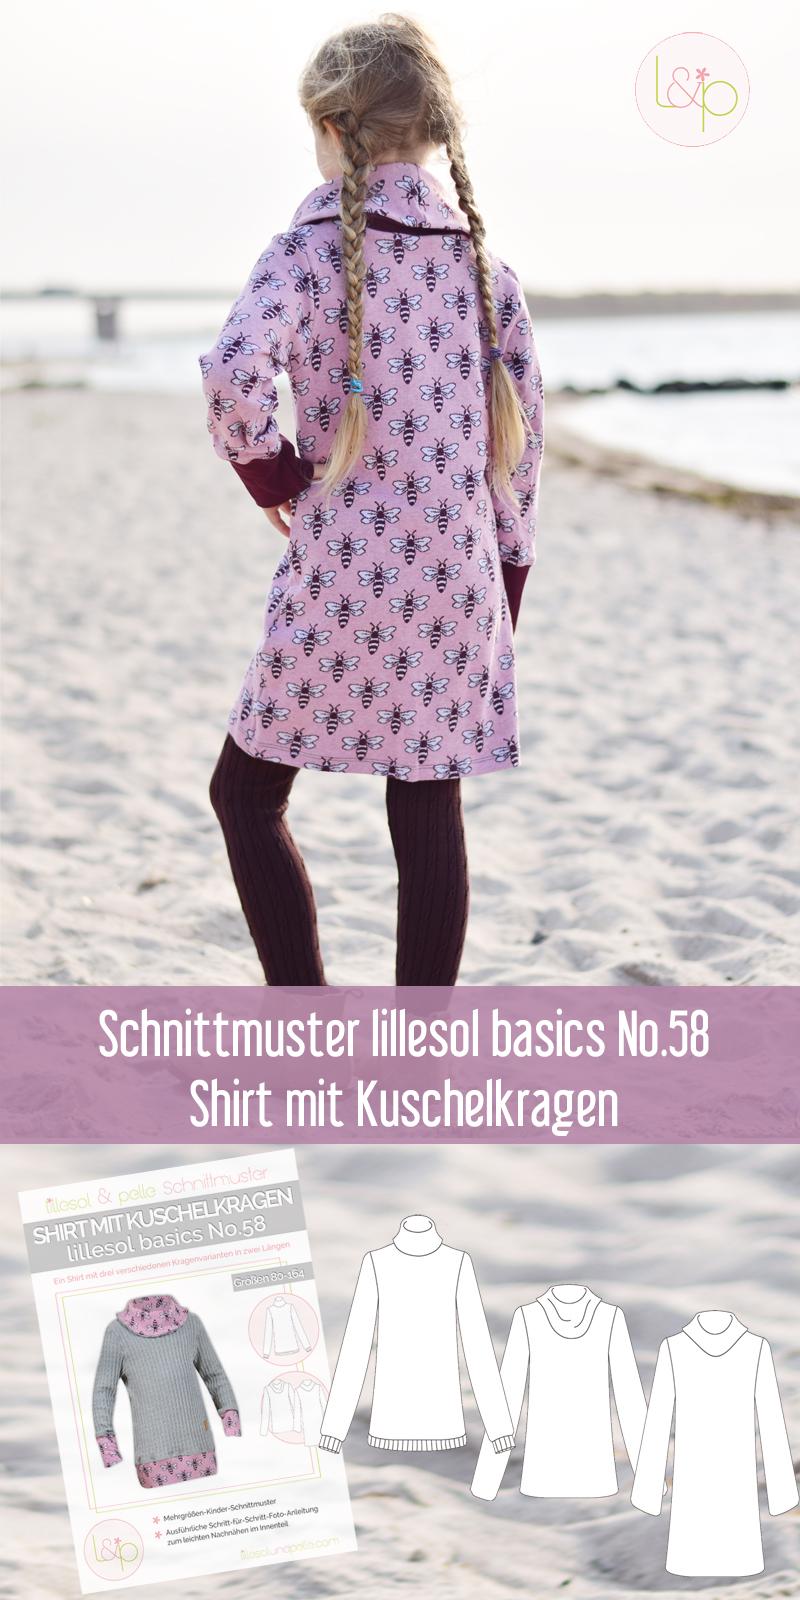 Schnittmuster nähen Kleid Rollkragen Schalkragen Jacquard Pattern Love Hamburger Liebe / sewing pattern turtleneck dress